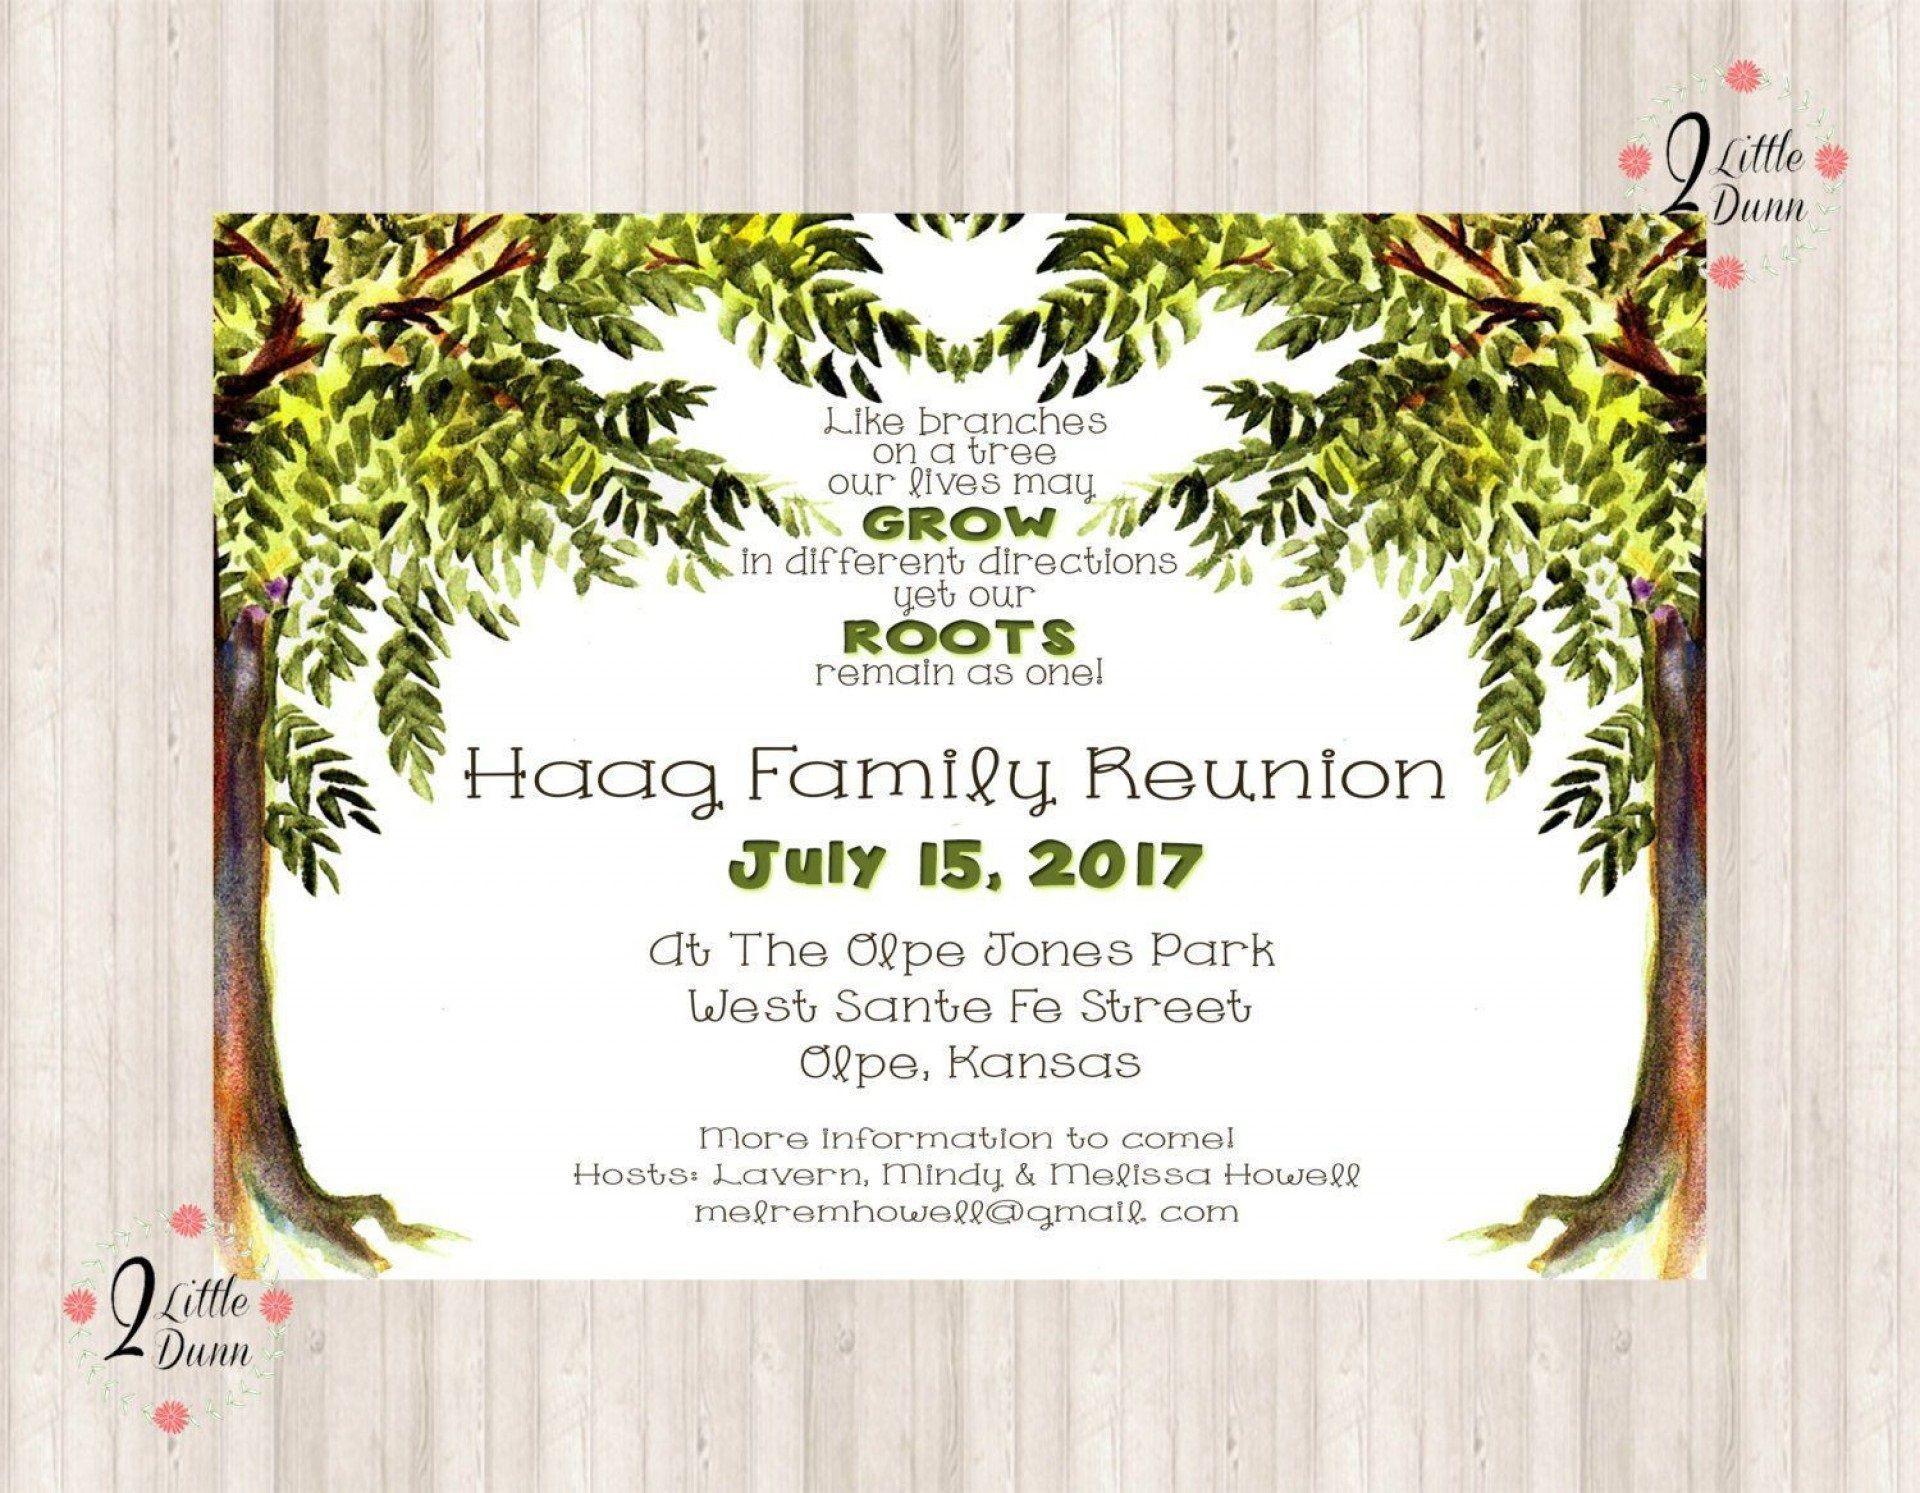 006 Impressive Free Family Reunion Flyer Template Word Idea 1920